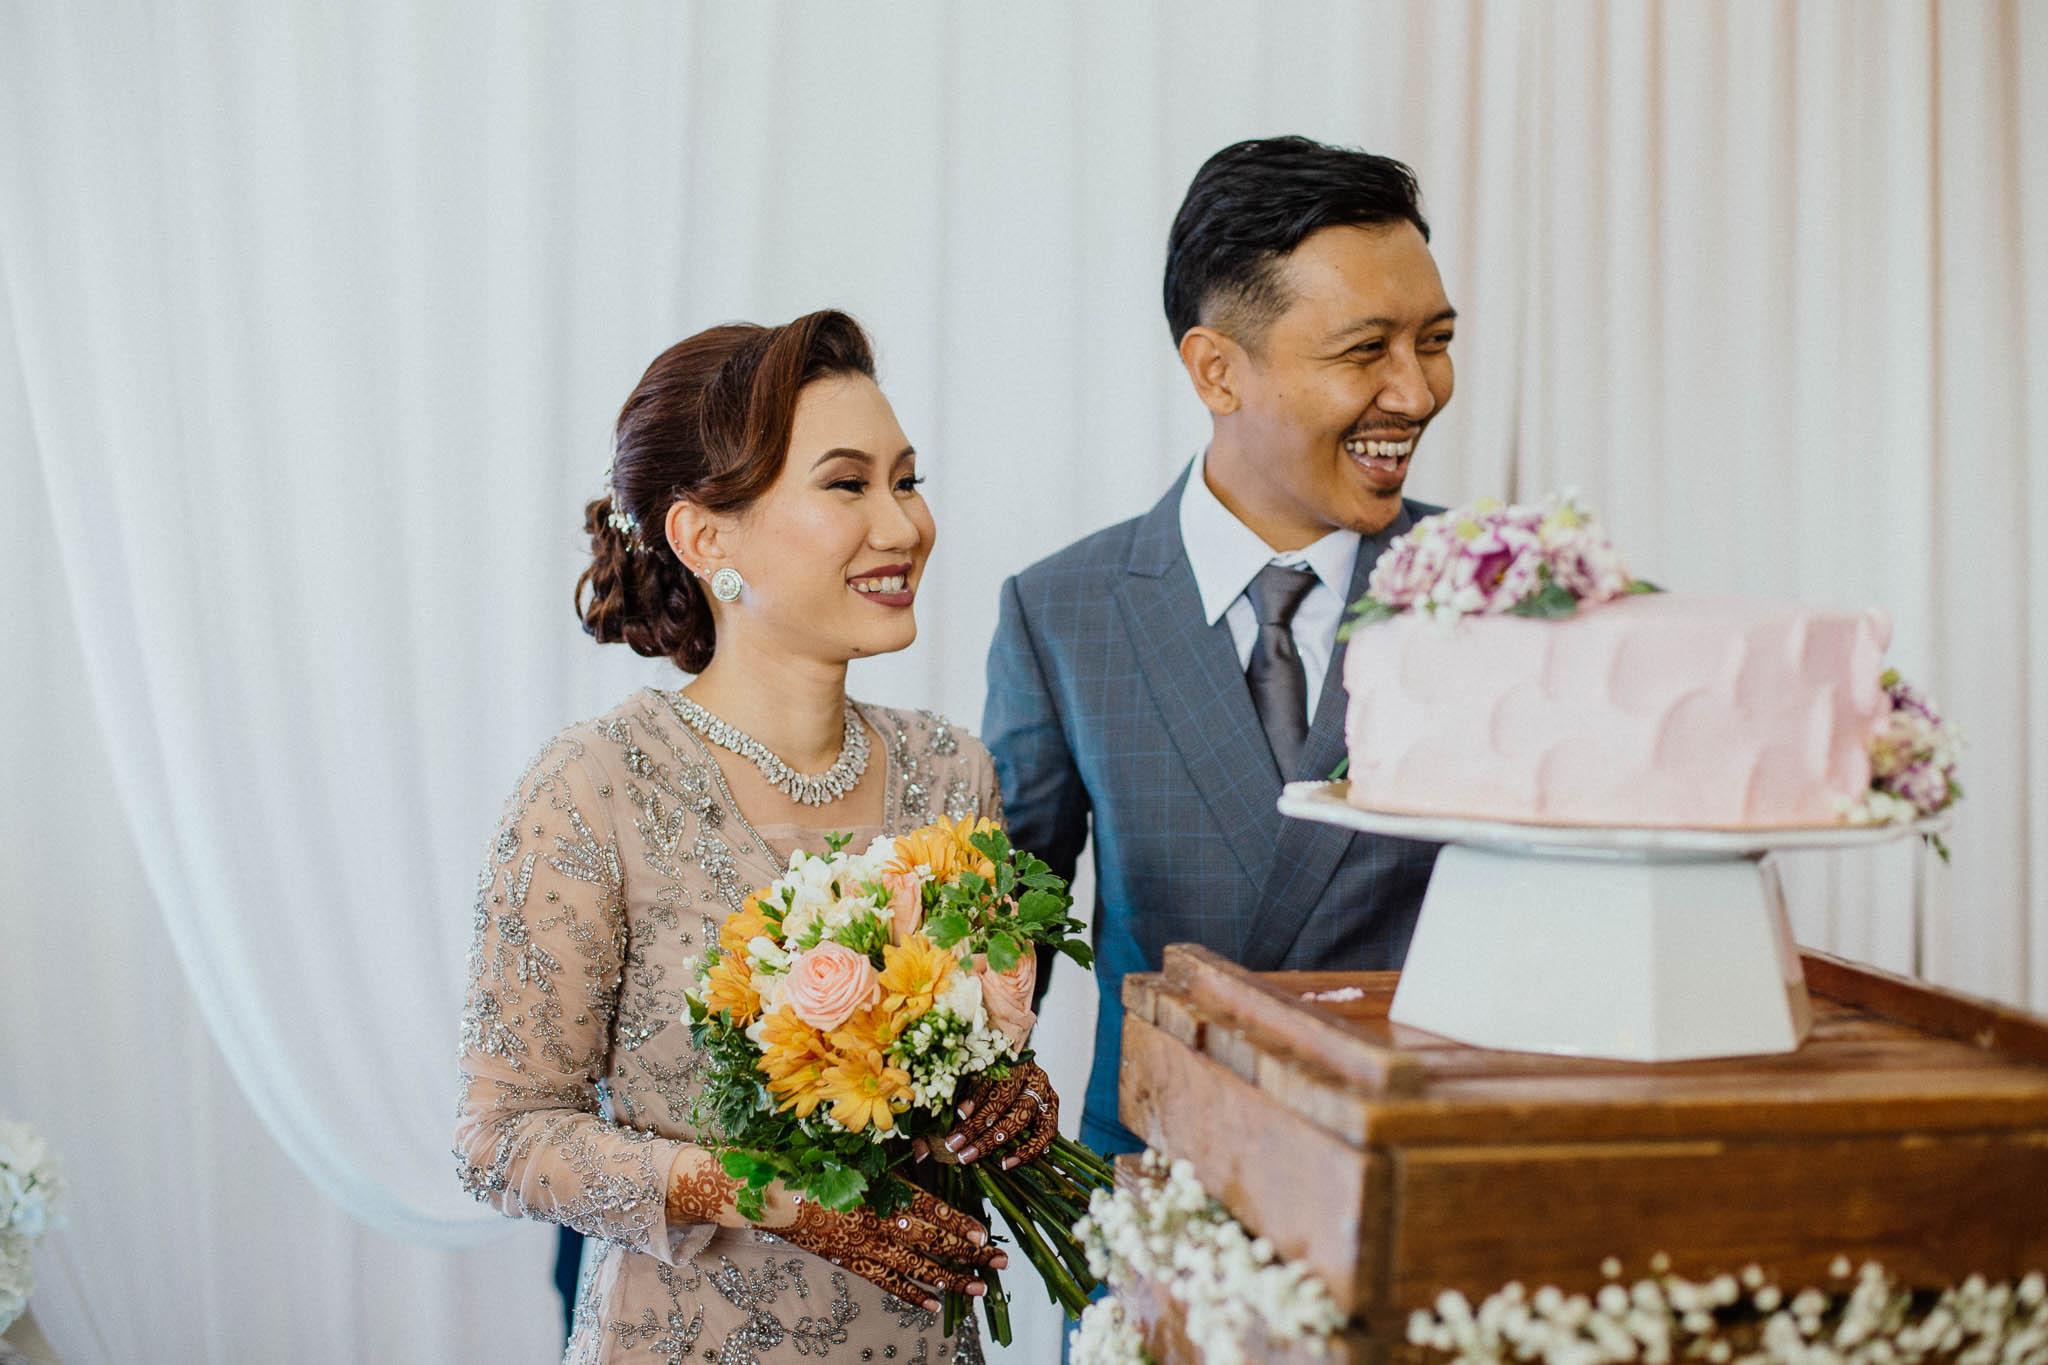 singapore-wedding-photographer-addafiq-nufail-054.jpg